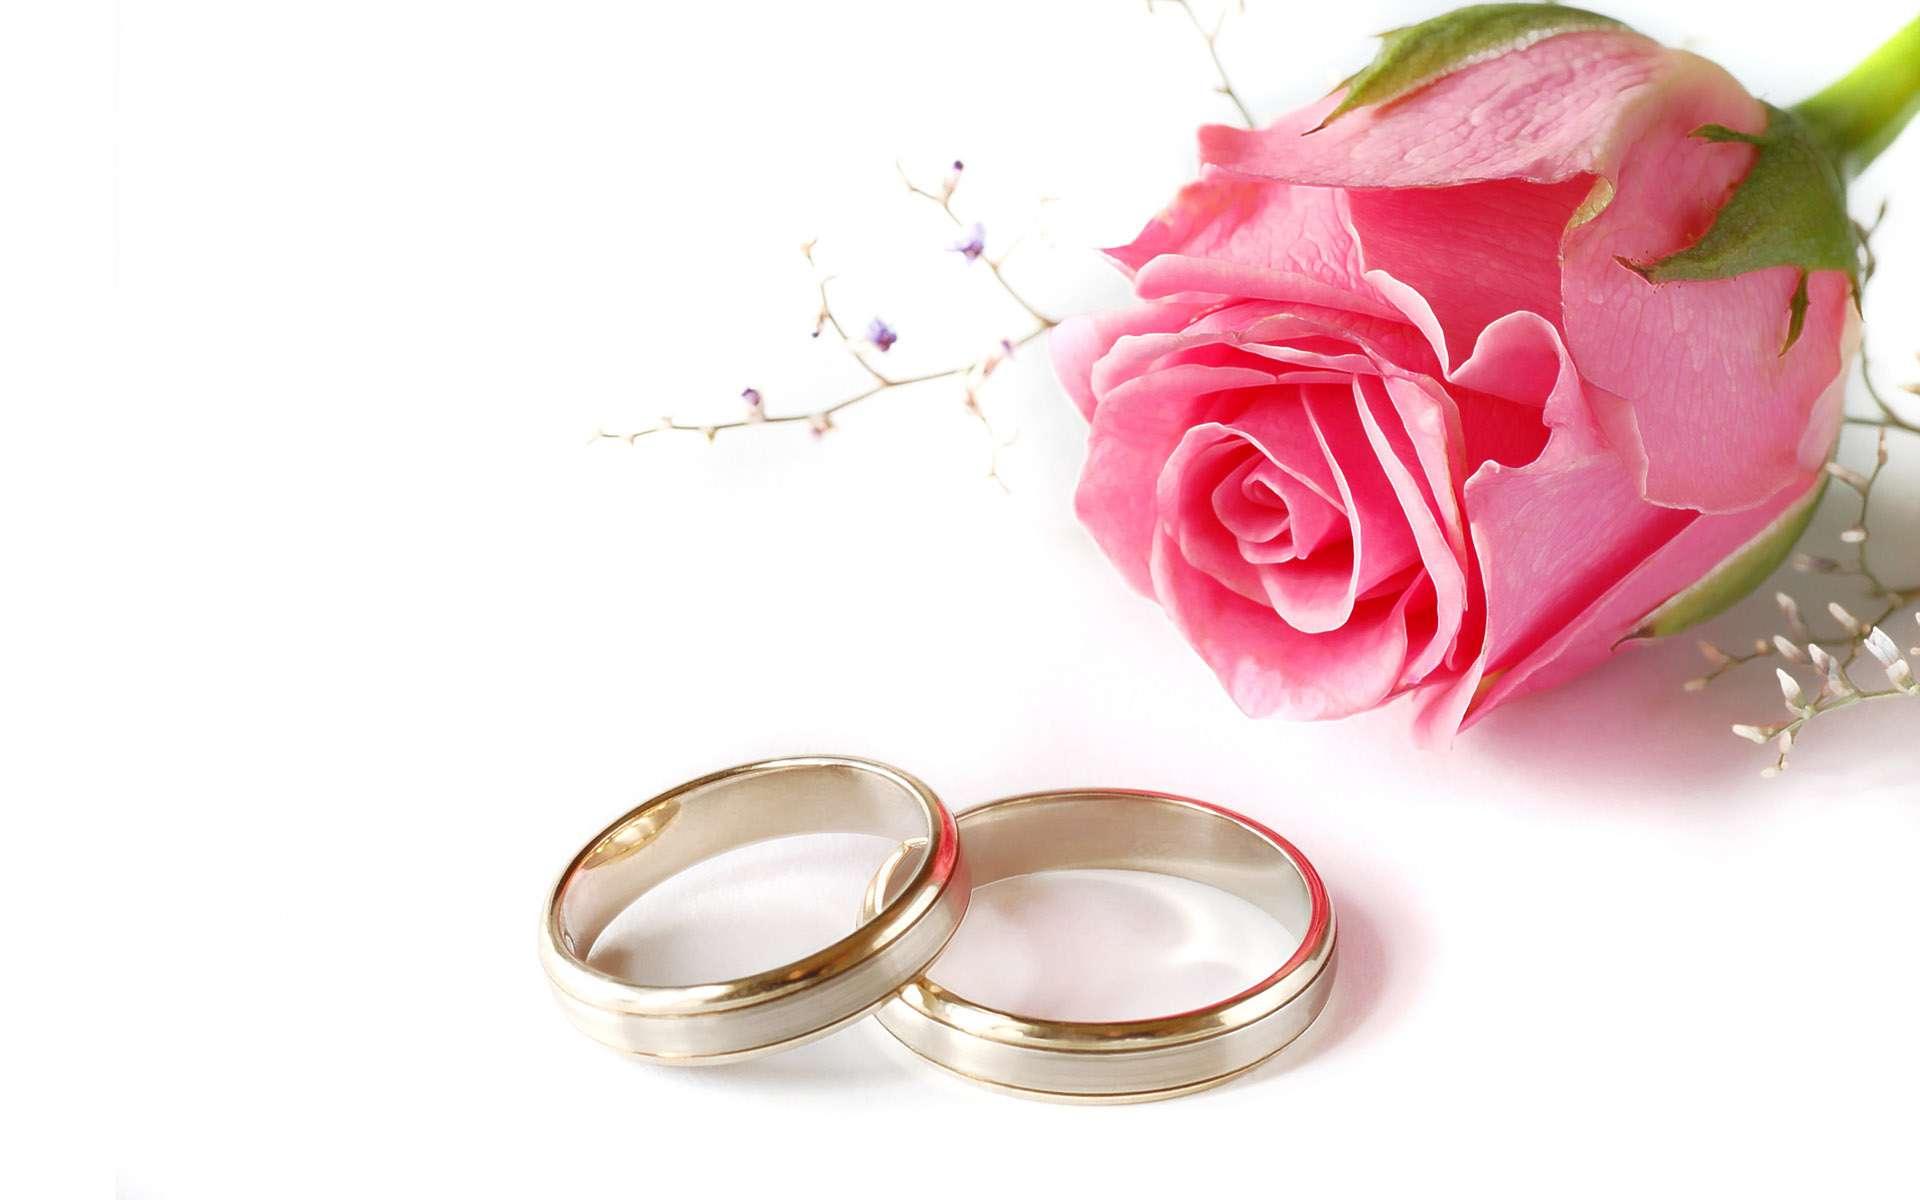 Wedding Background 3 1920x1200